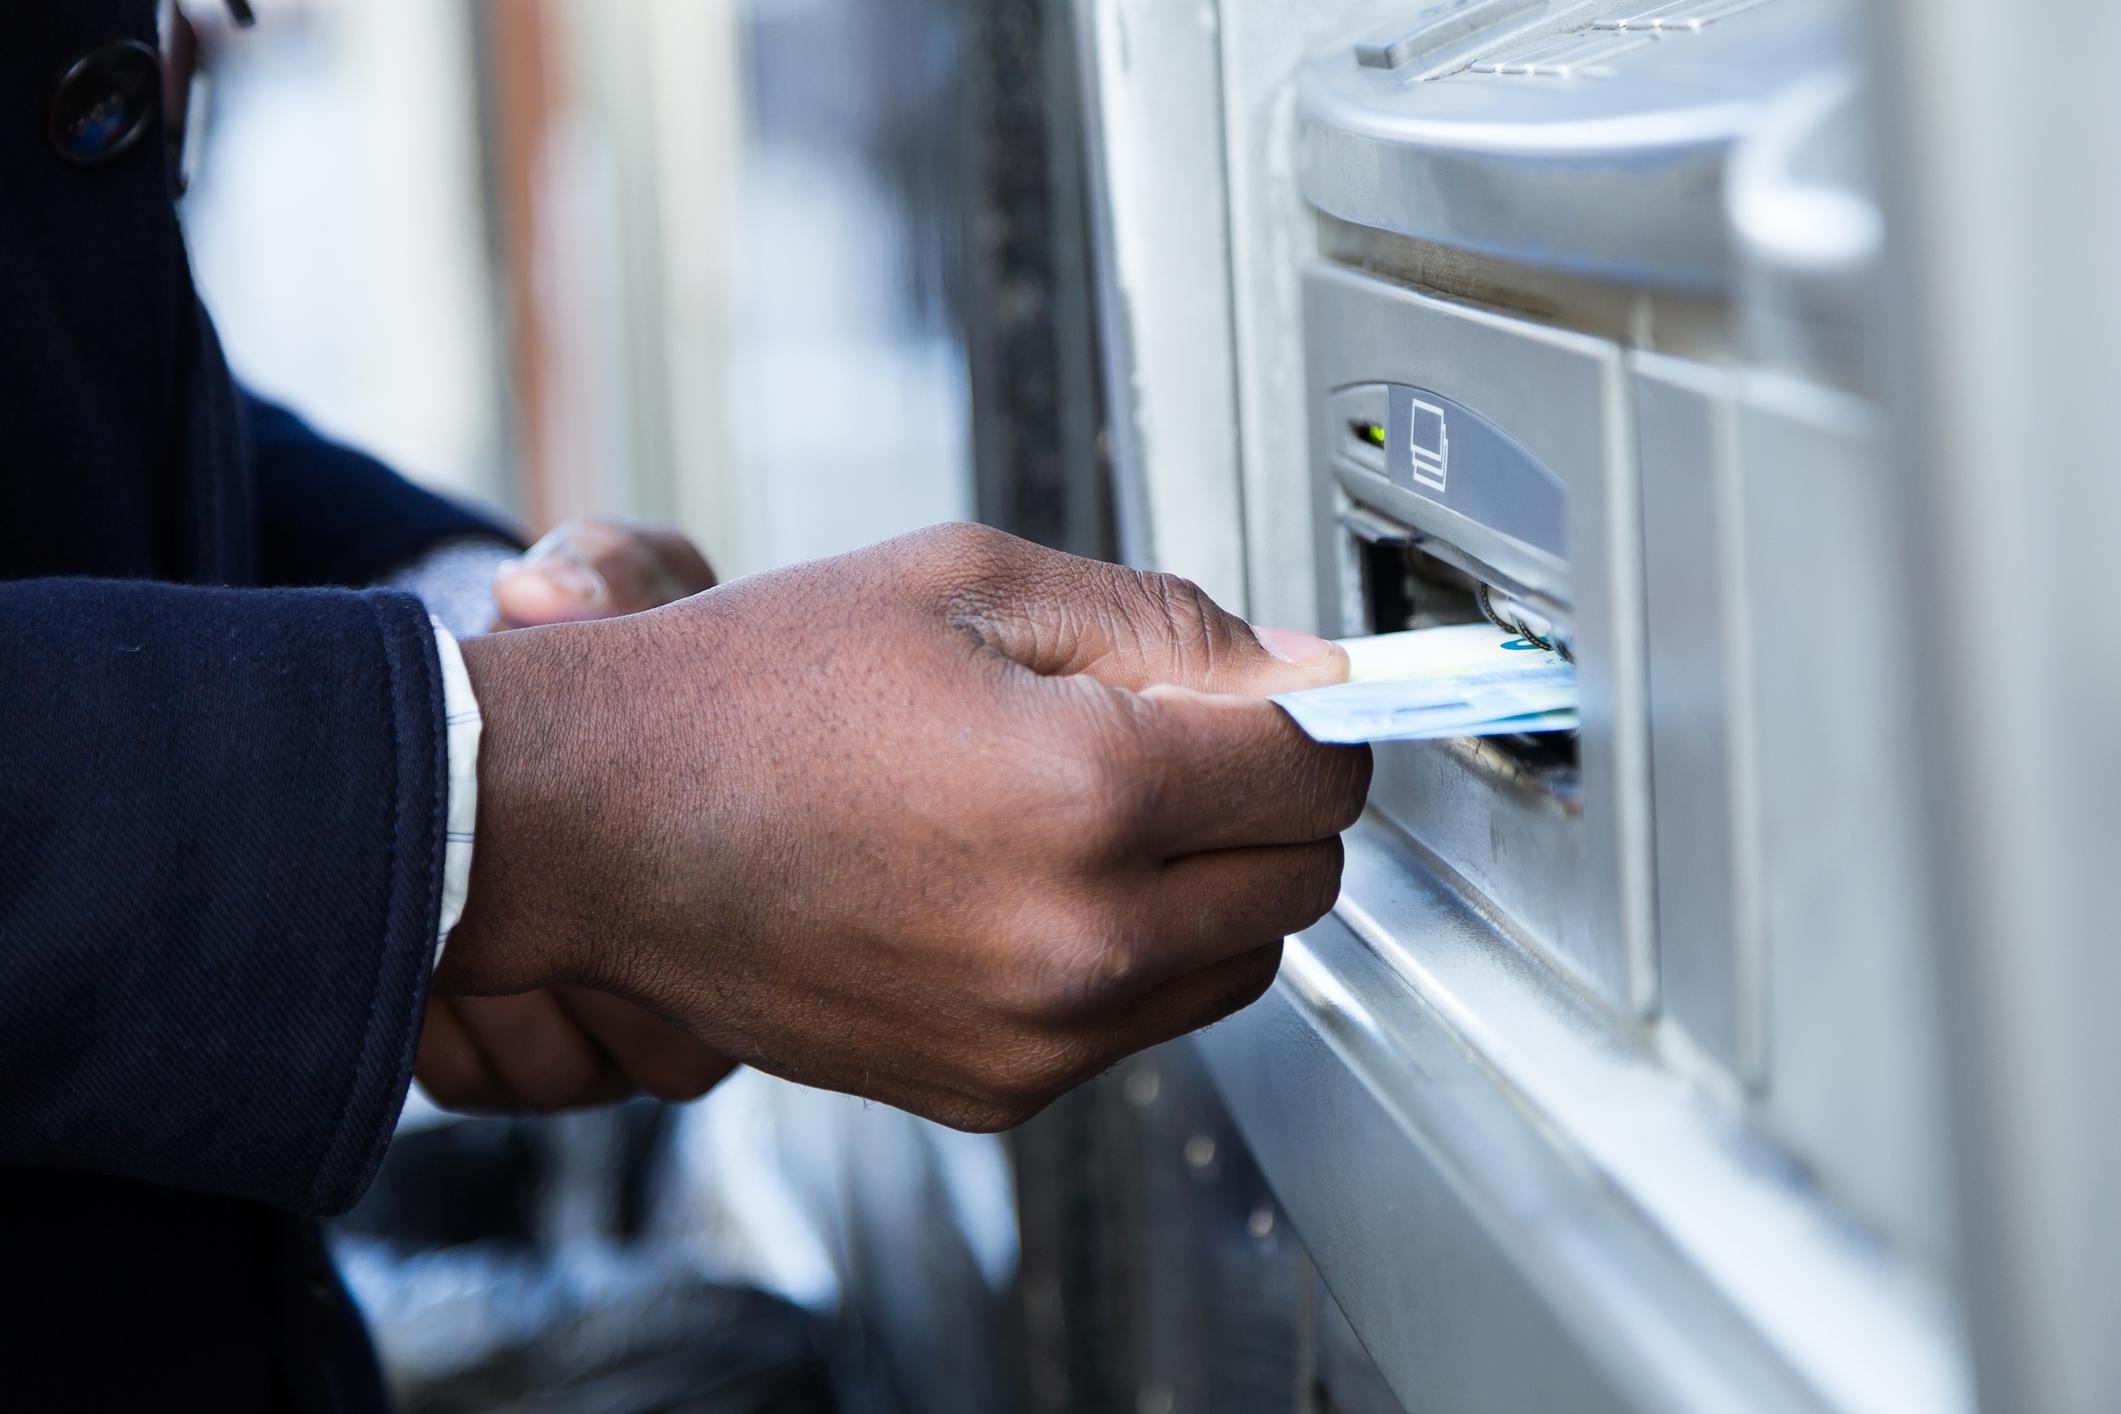 Person using ATM machine.